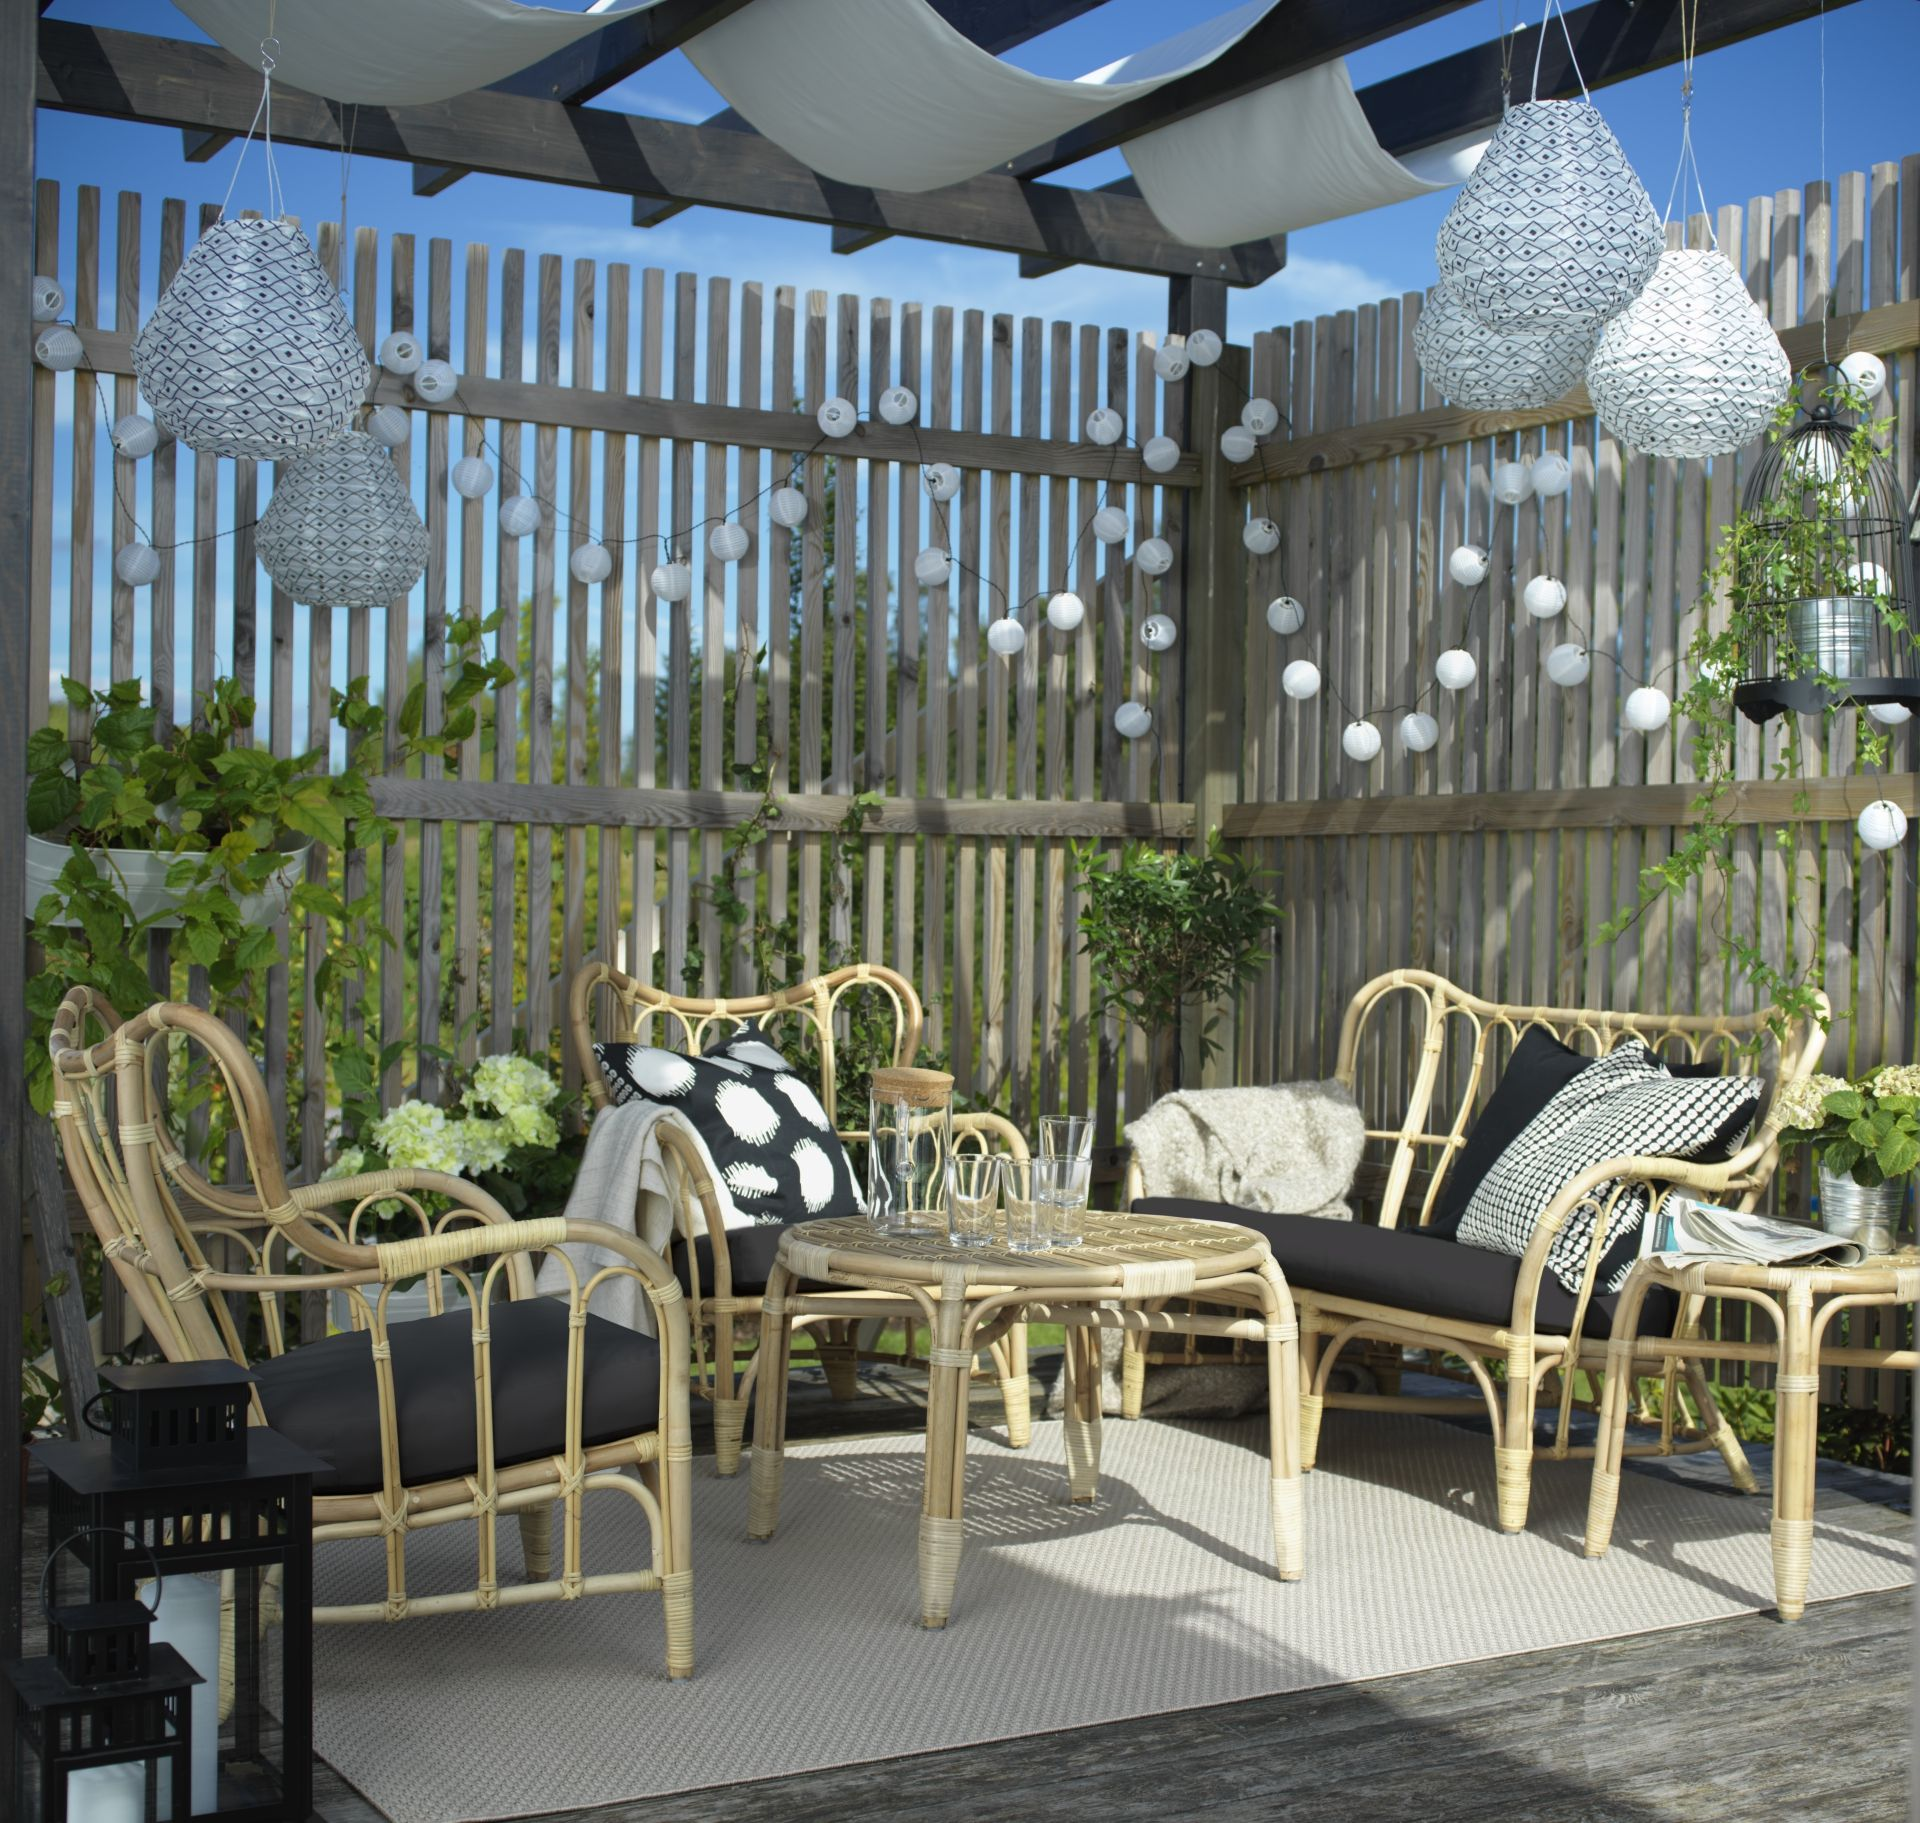 MASTHOLMEN Loungeset 4-zits, rotan | Outdoor living, Gardens and ...